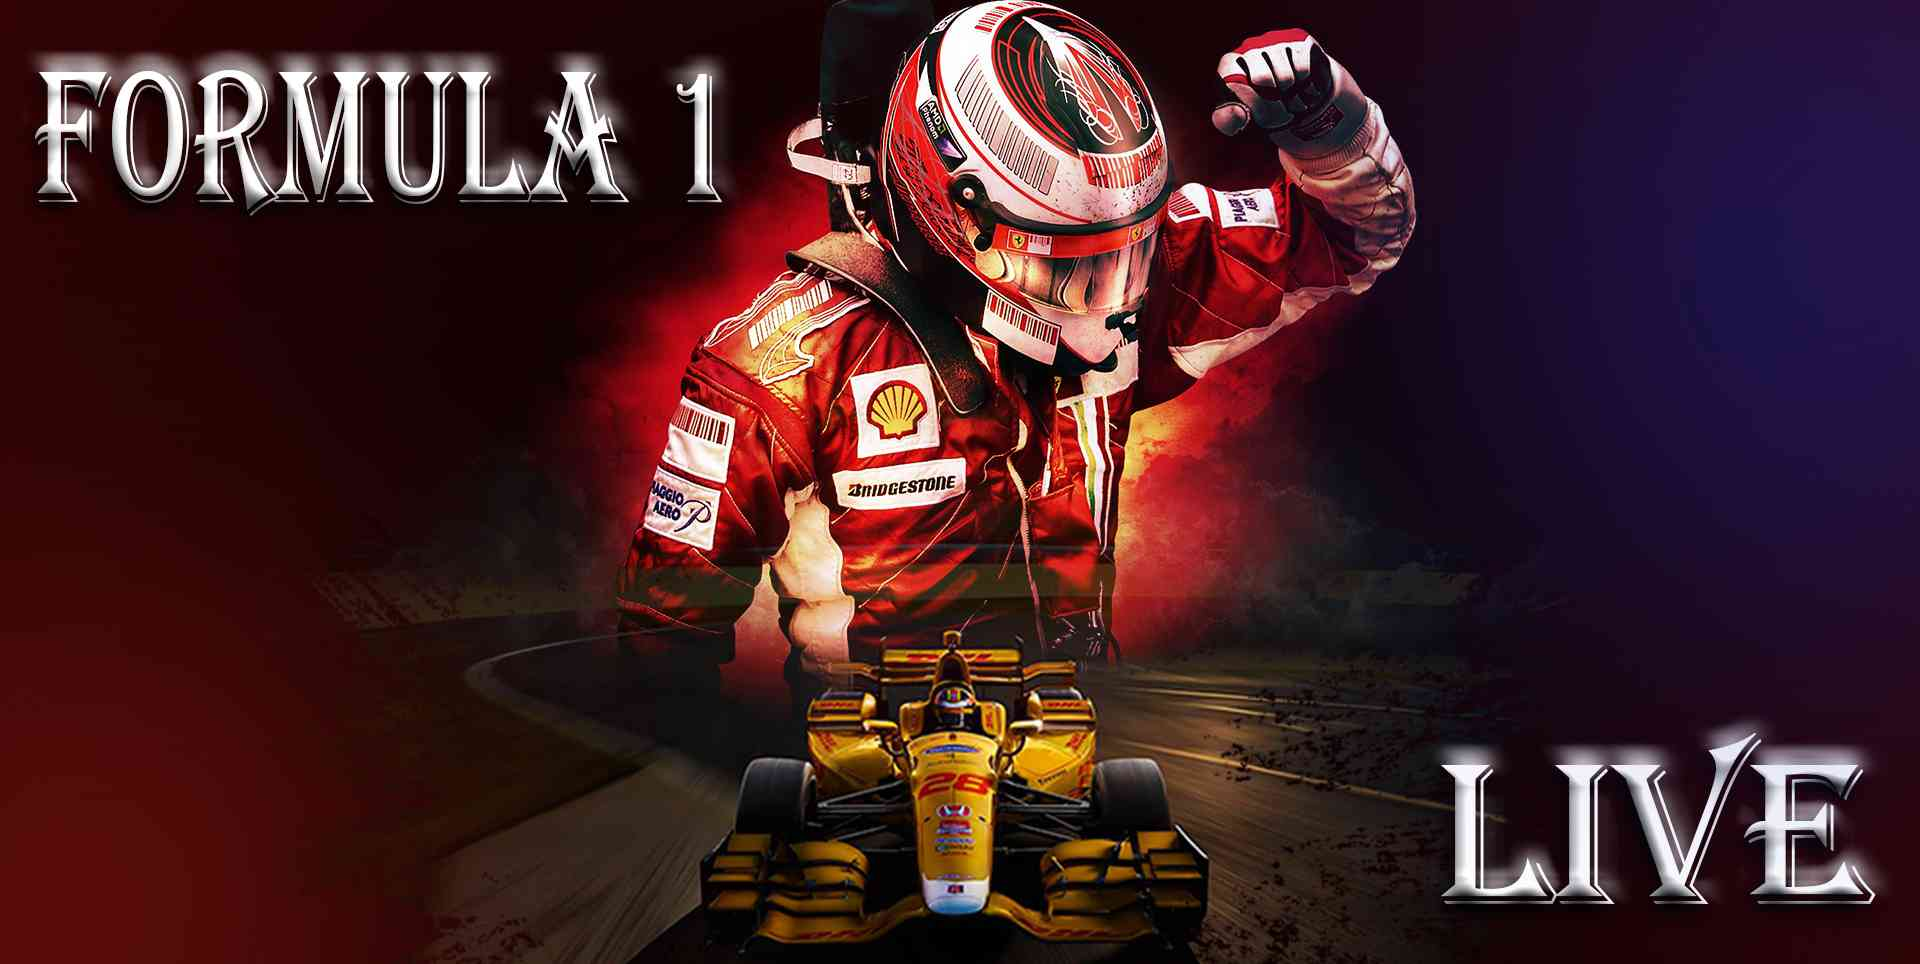 2016-brdc-formula-3-car